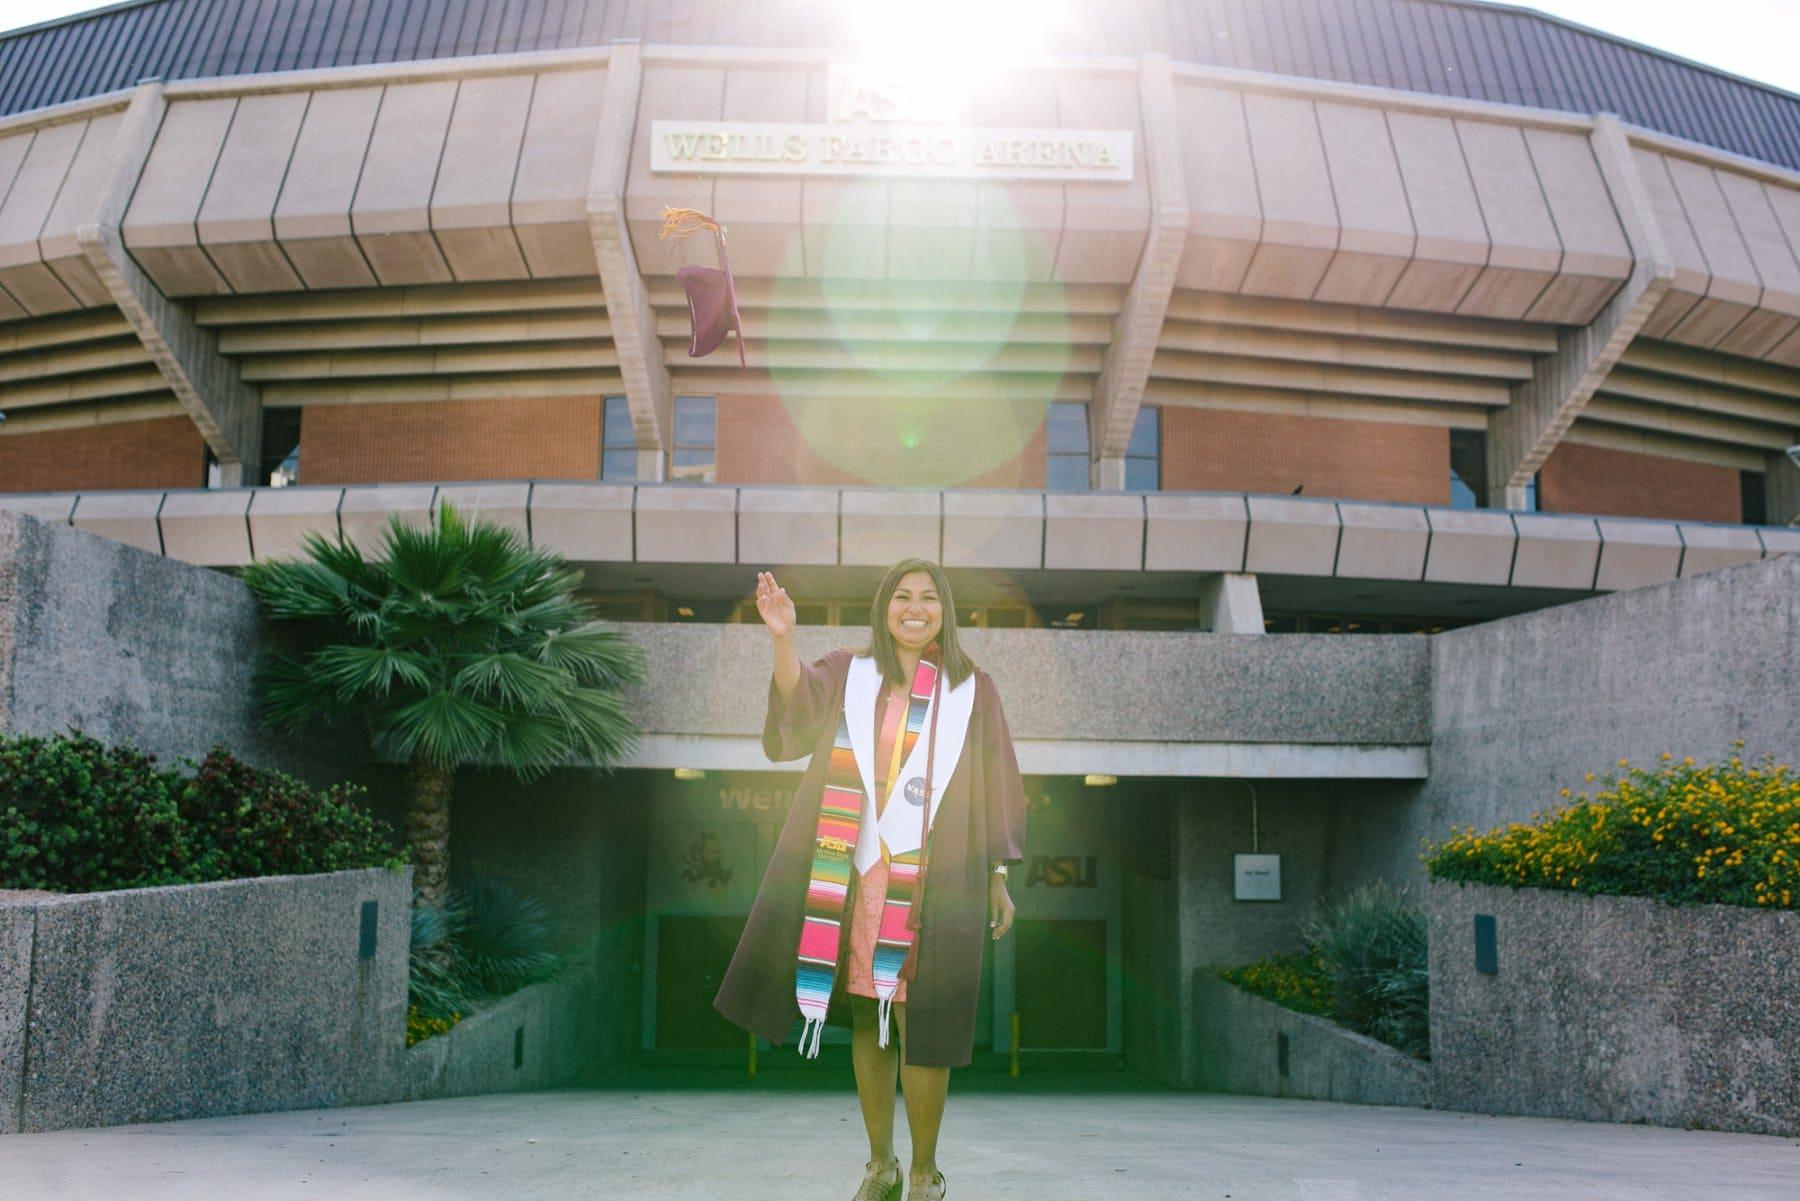 Arizona State University college grad tossing cap in front of Wells Fargo Arena